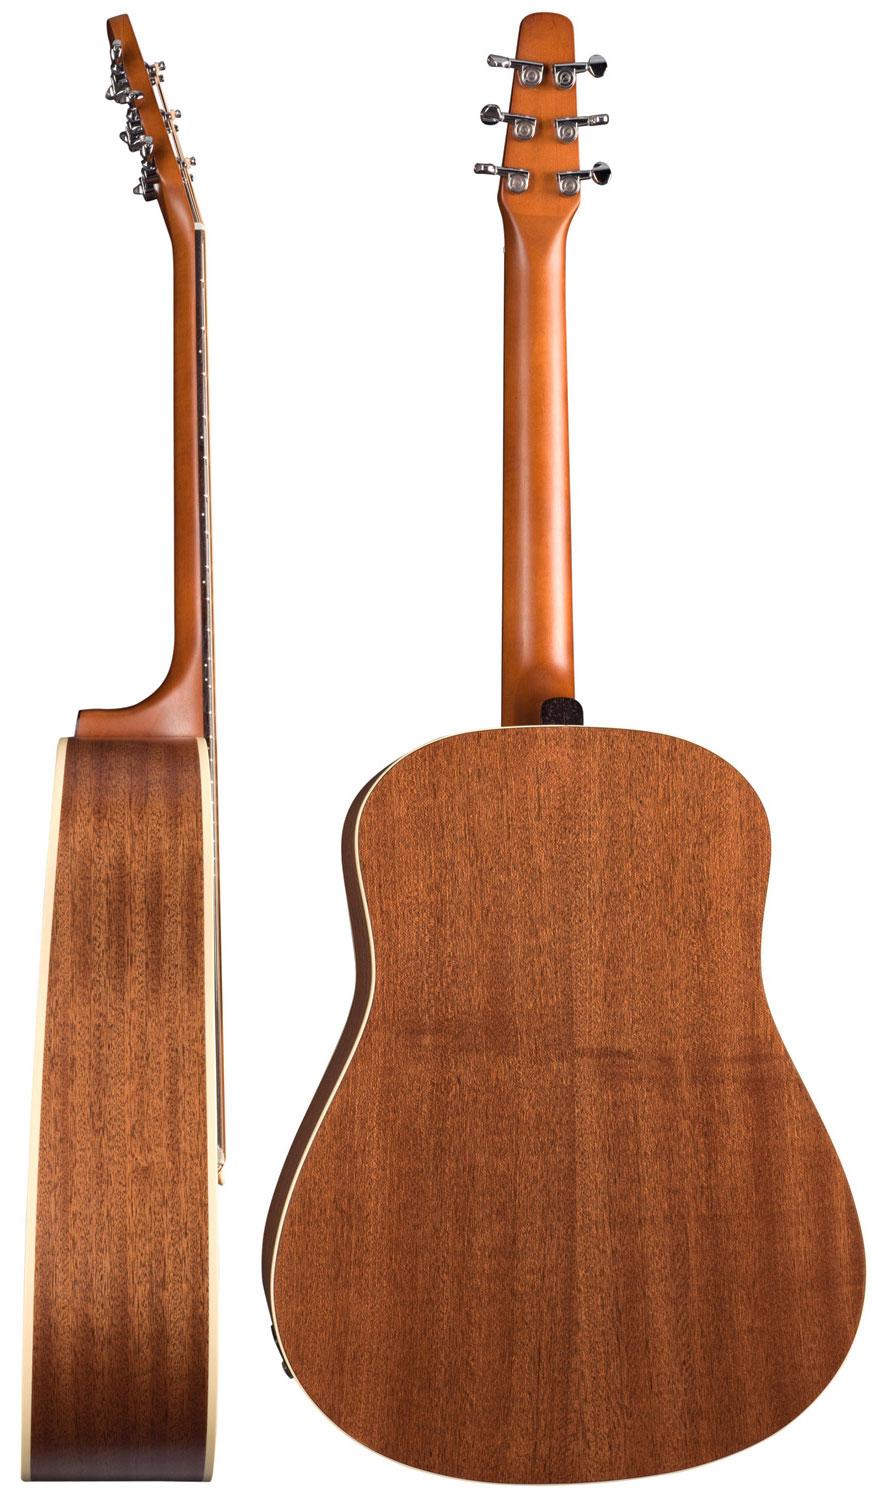 guitare folk seagull s6 mahogany deluxe a e bag star 39 s music. Black Bedroom Furniture Sets. Home Design Ideas